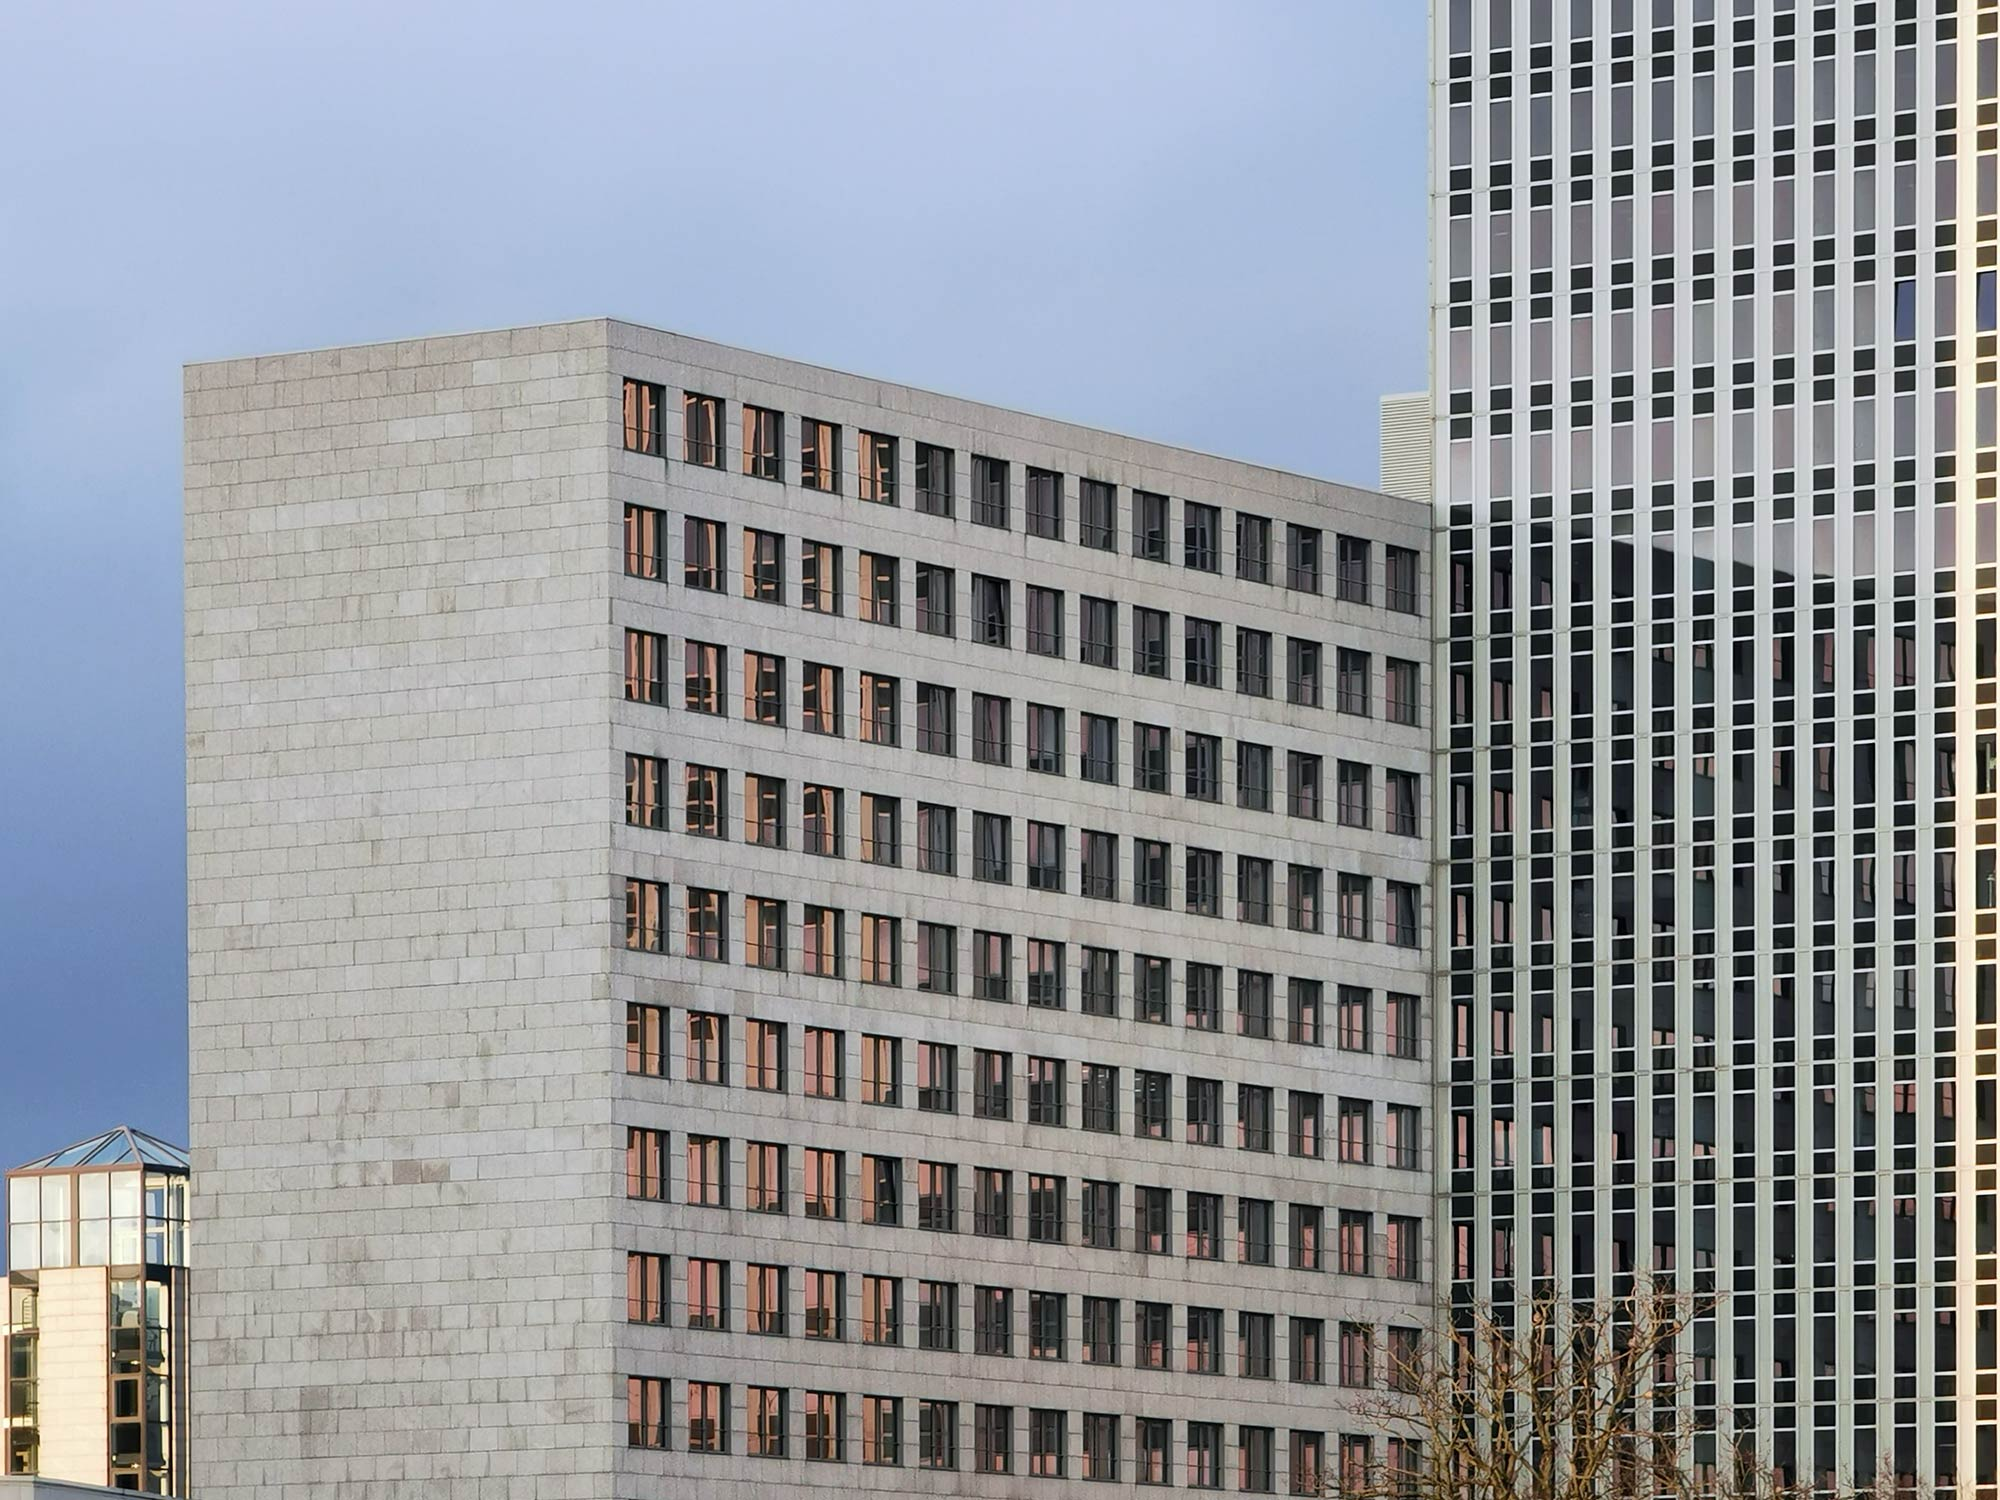 Arcor-Haus Eschborn - Vodafone Tower - Horizon Tower Eschborn